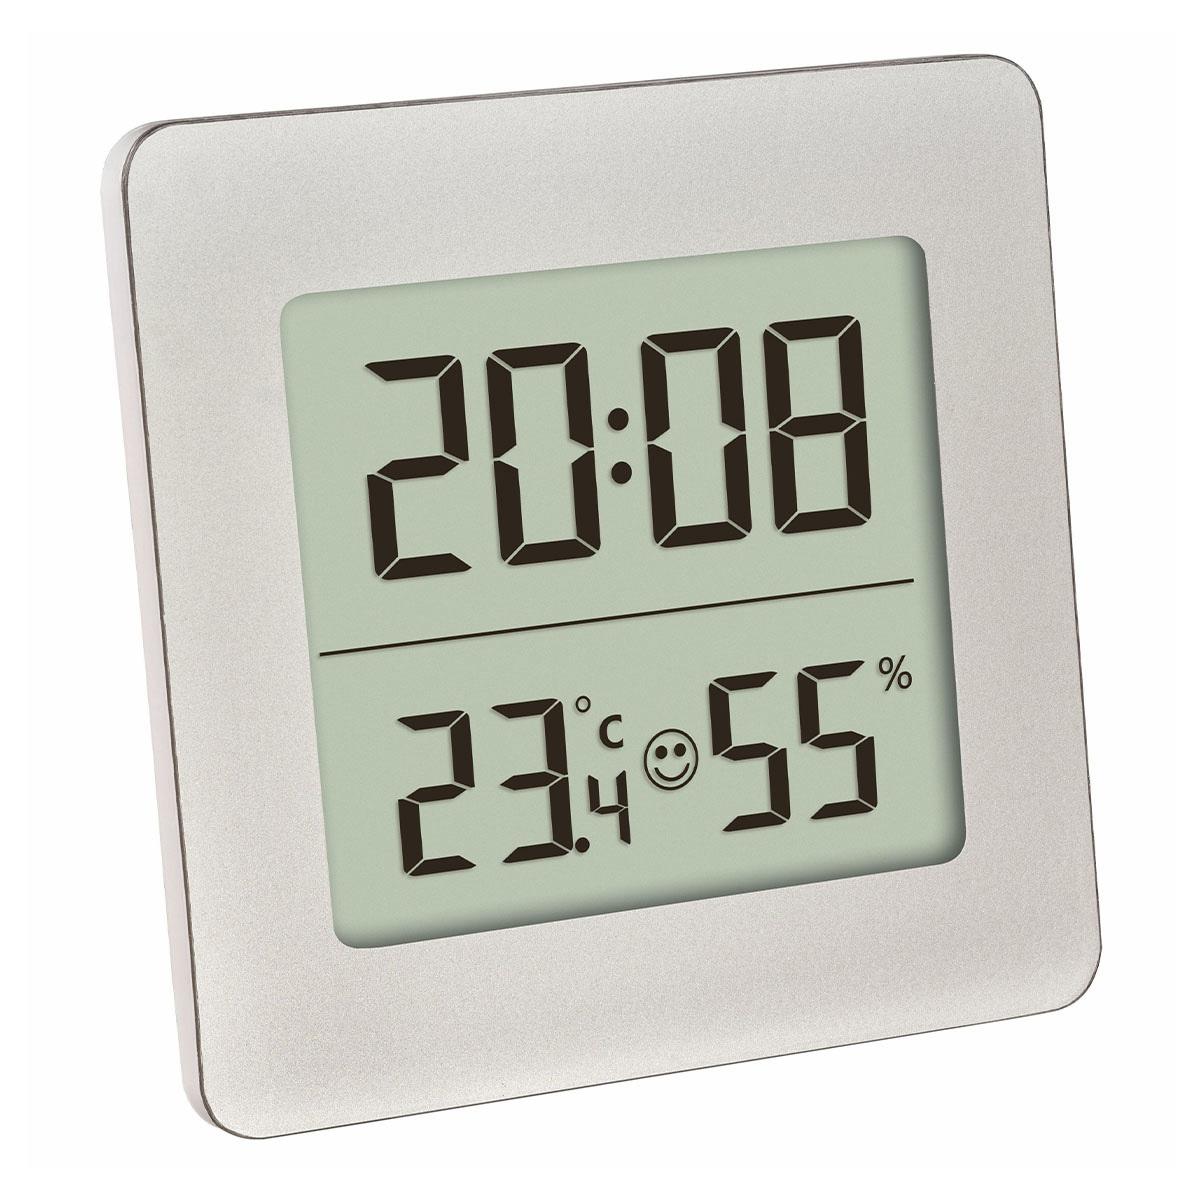 30-5038-54-digitales-thermo-hygrometer-ansicht-1200x1200px.jpg